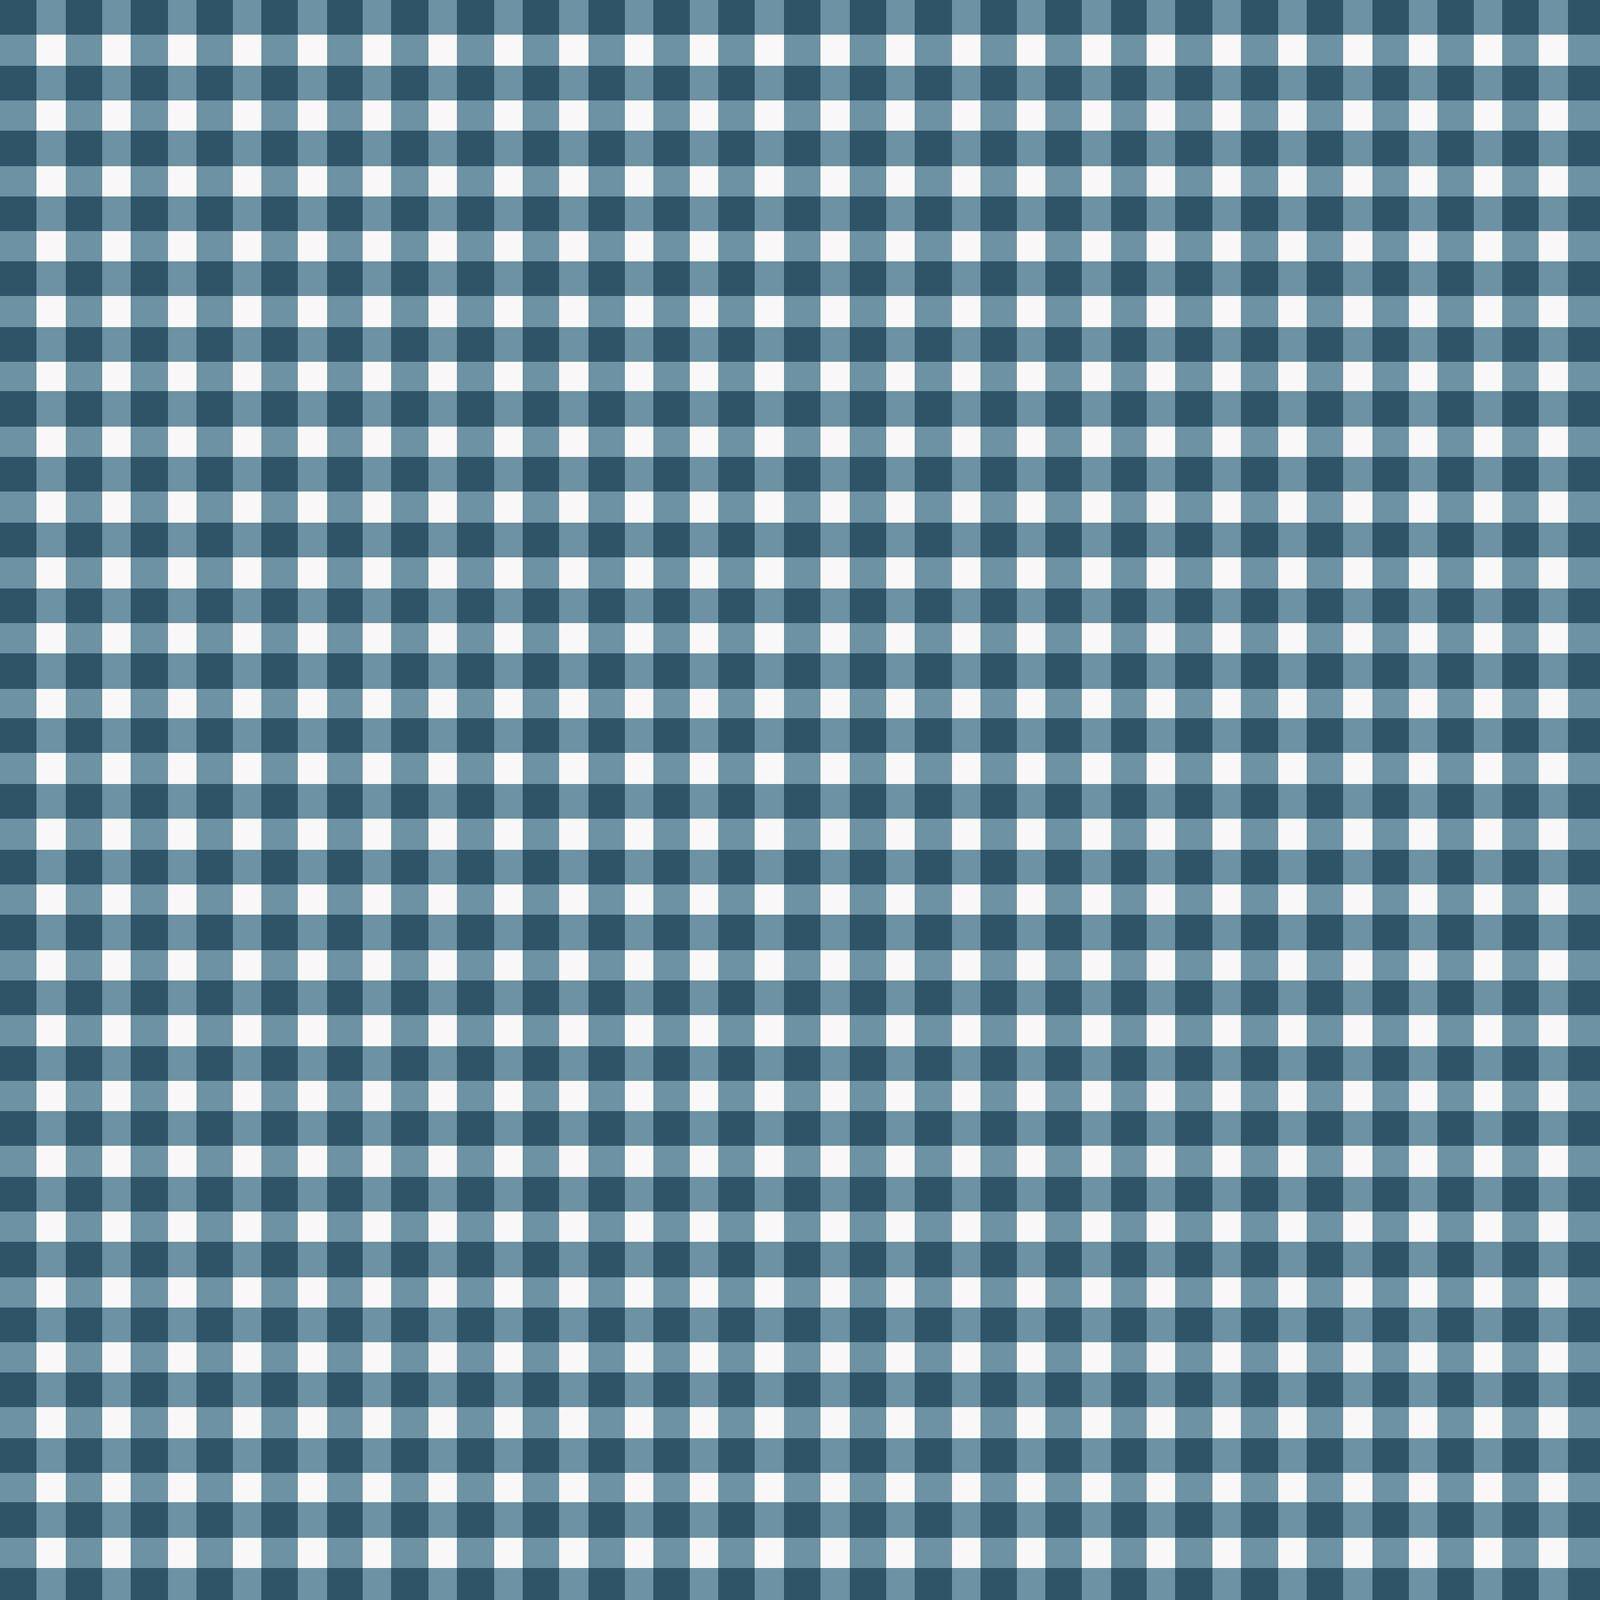 EESC-610 N2 - BEAUTIFUL BASICS BY MAYWOOD STUDIO CLASSIC CHECK OCEAN BLUE